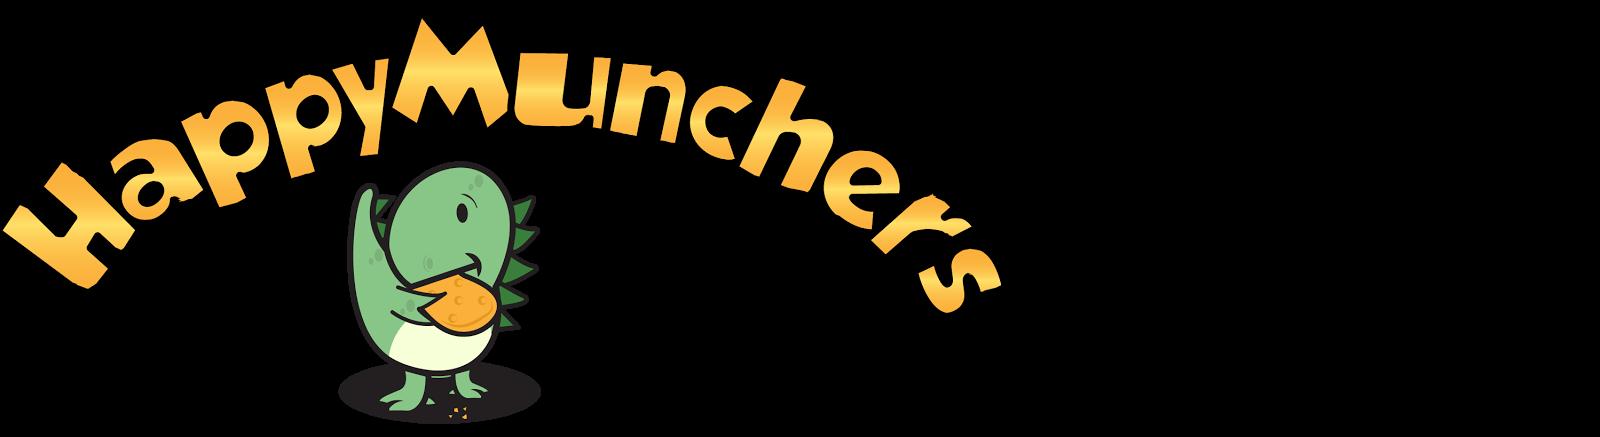 HappyMunchers